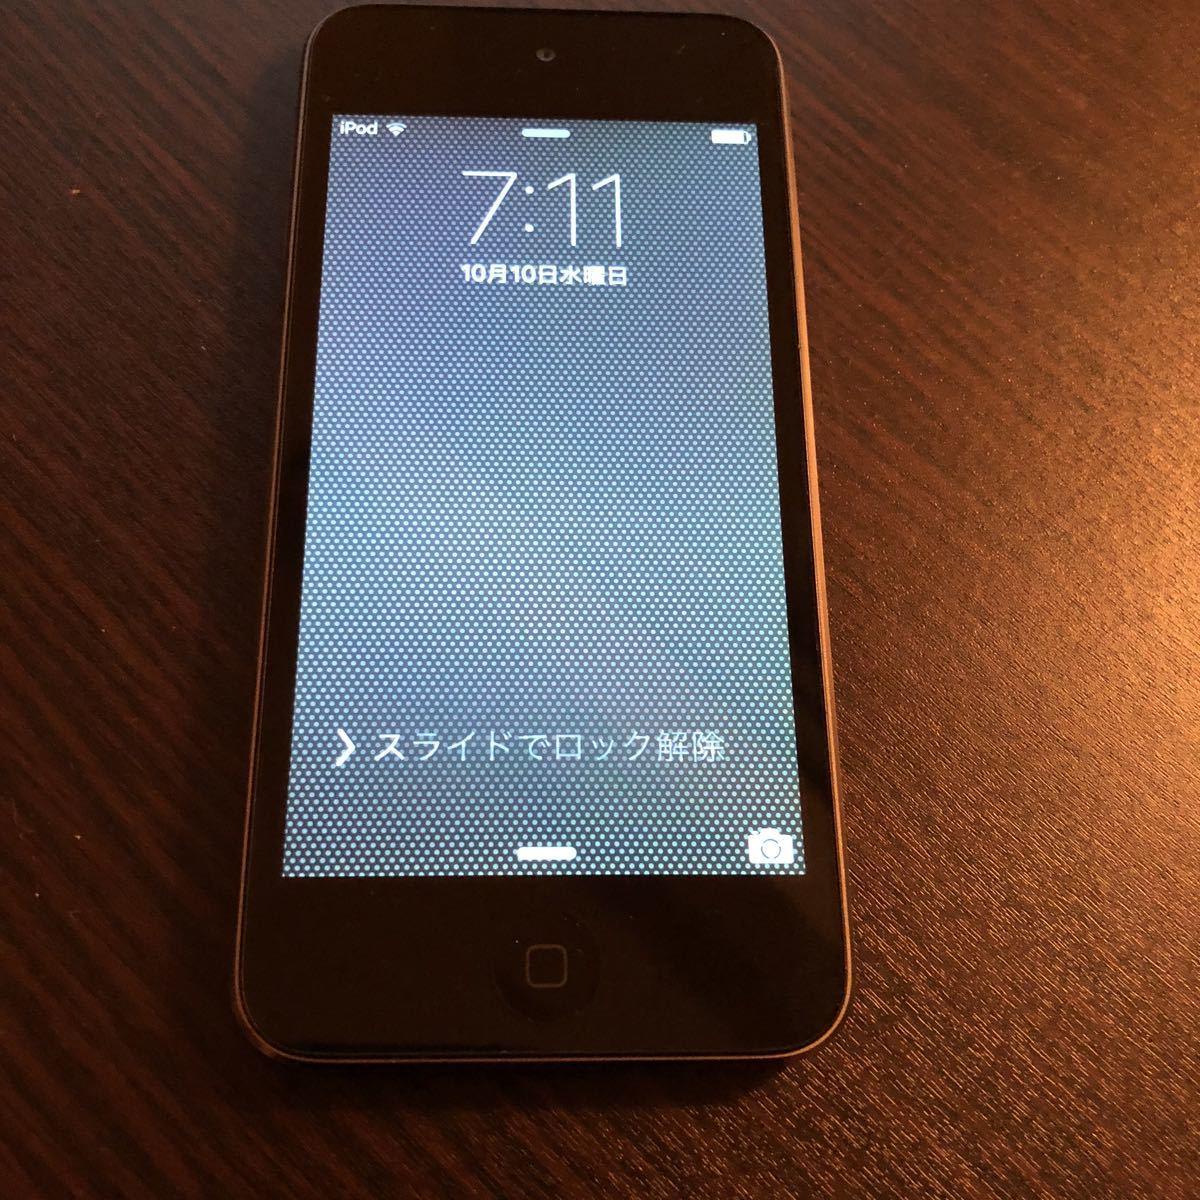 Apple iPod touch 16GB Black 5世代 美品